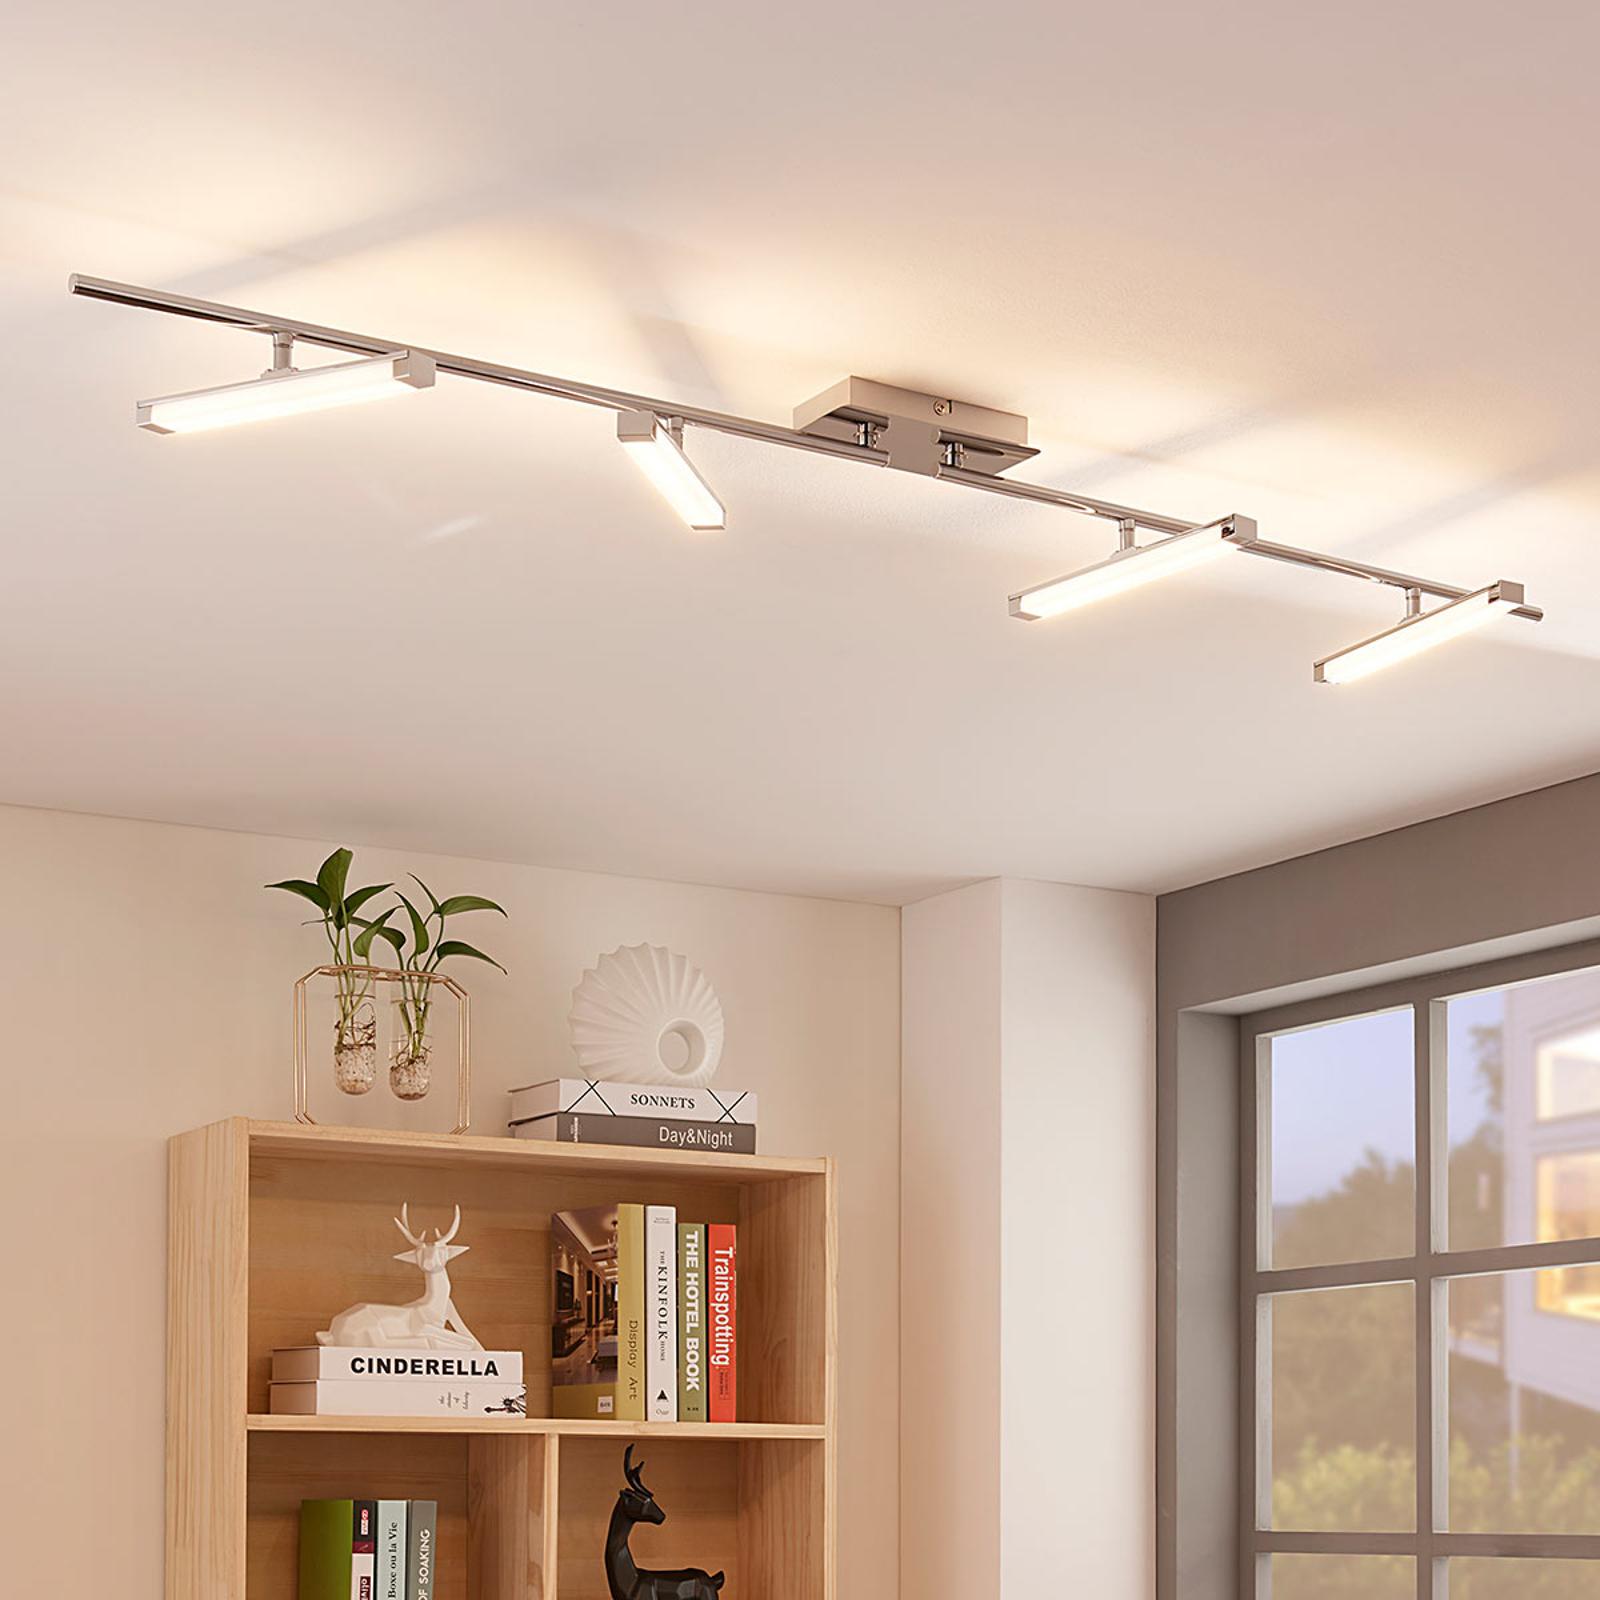 Pilou - 4-flammige LED-Deckenleuchte, dimmbar